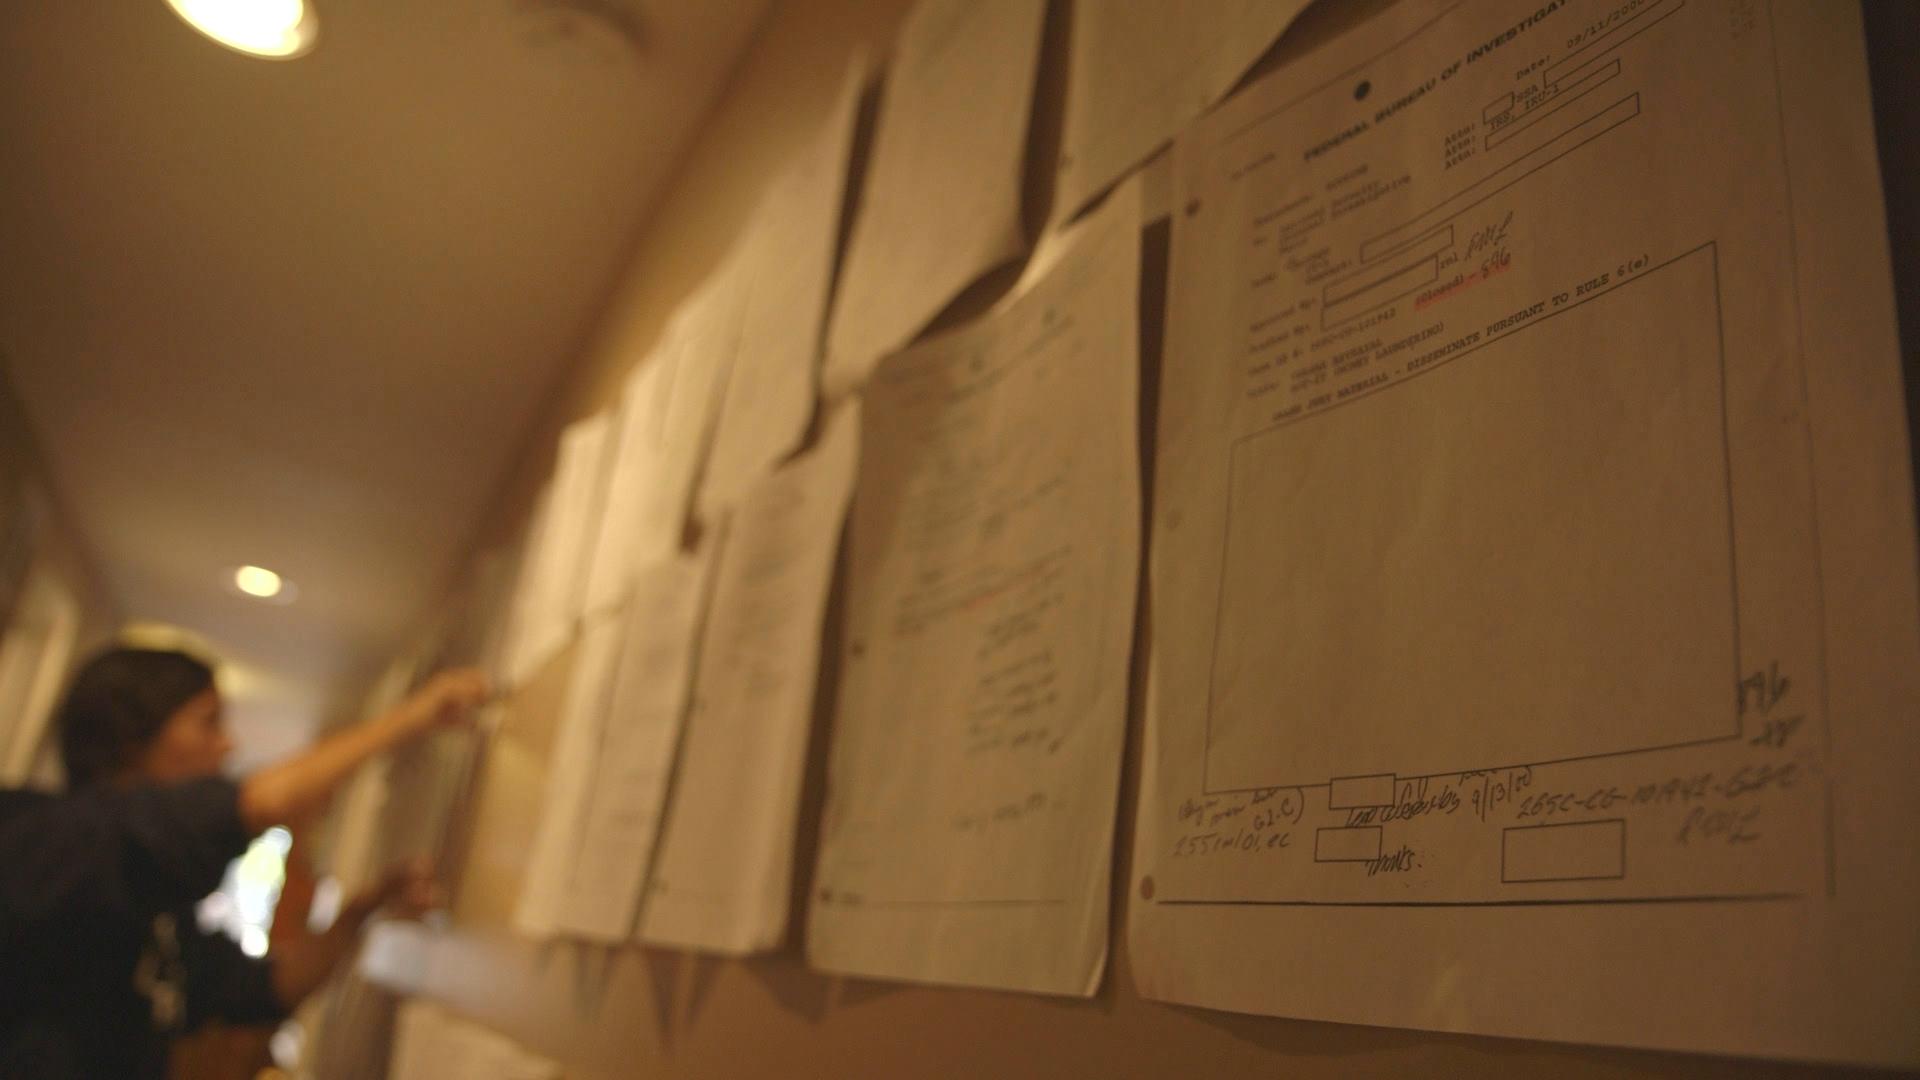 FOBW Stills_Assia hanging documents 03.jpg